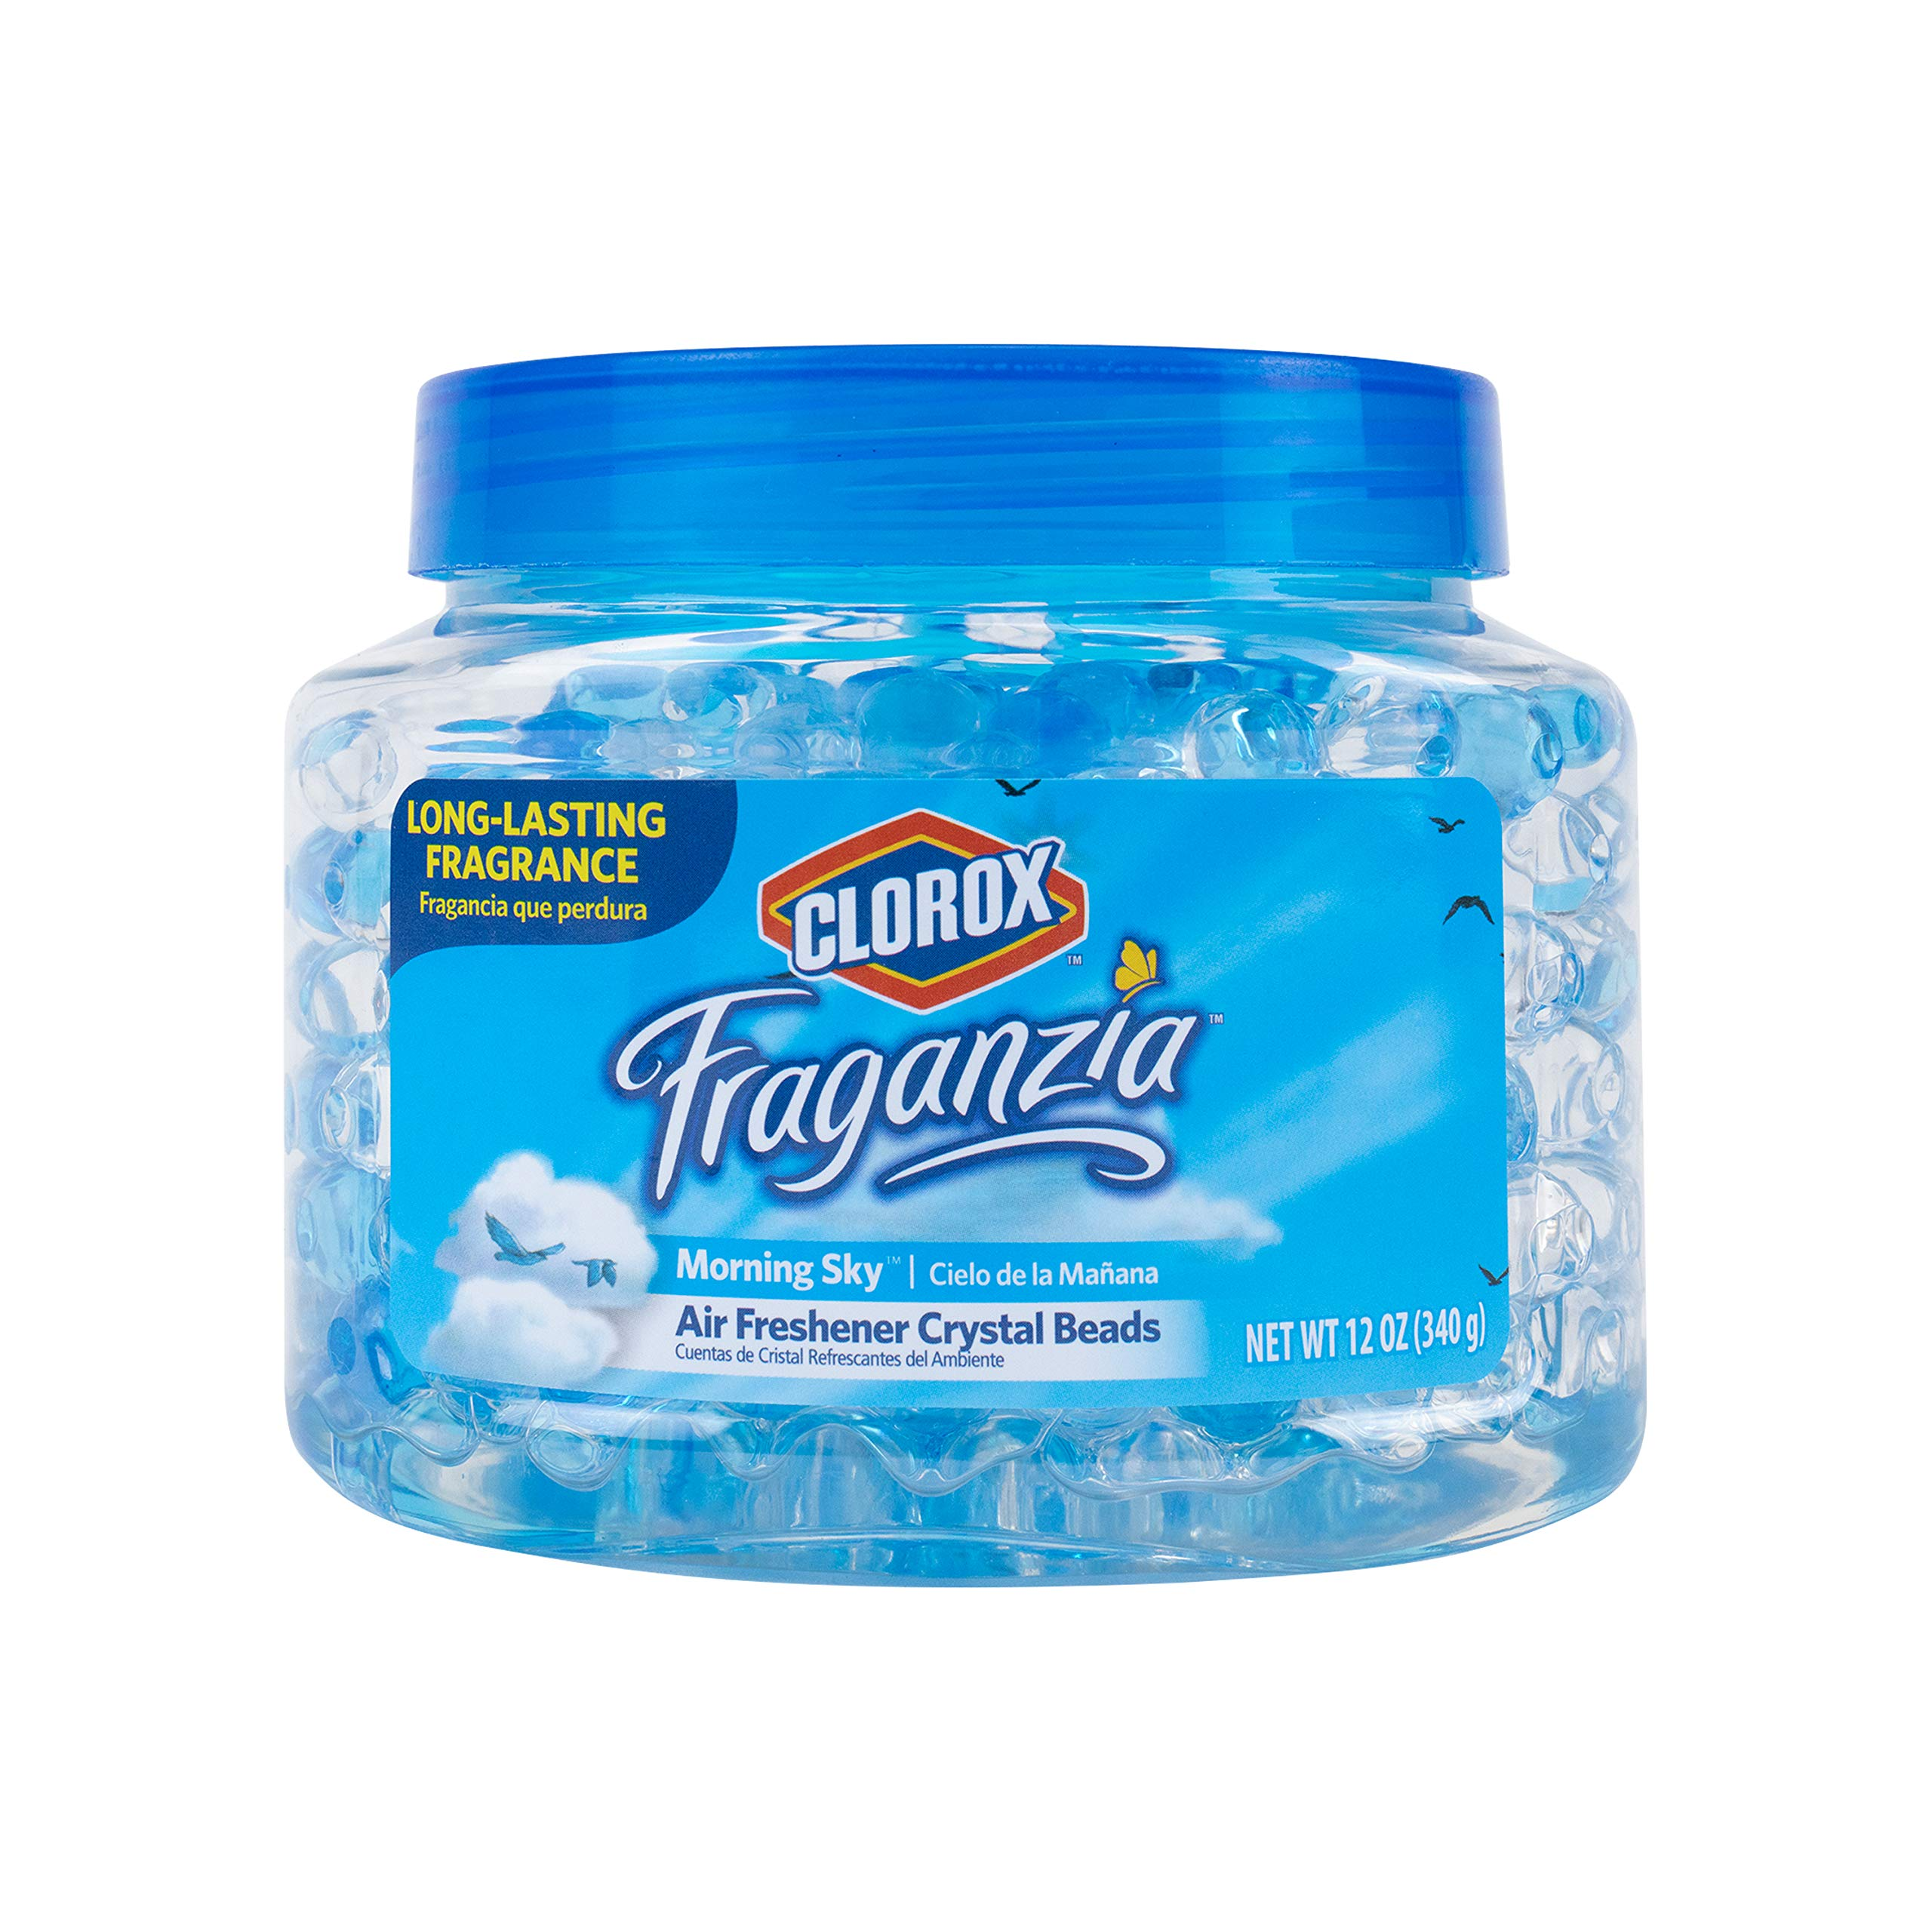 Clorox Fraganzia Crystal Beads Air Freshener | Long-Lasting Air Freshener Beads | Gel Beads Air Freshener in Spring Fragrance for Home, Bathroom, or Car, 12 Oz -6 Pack